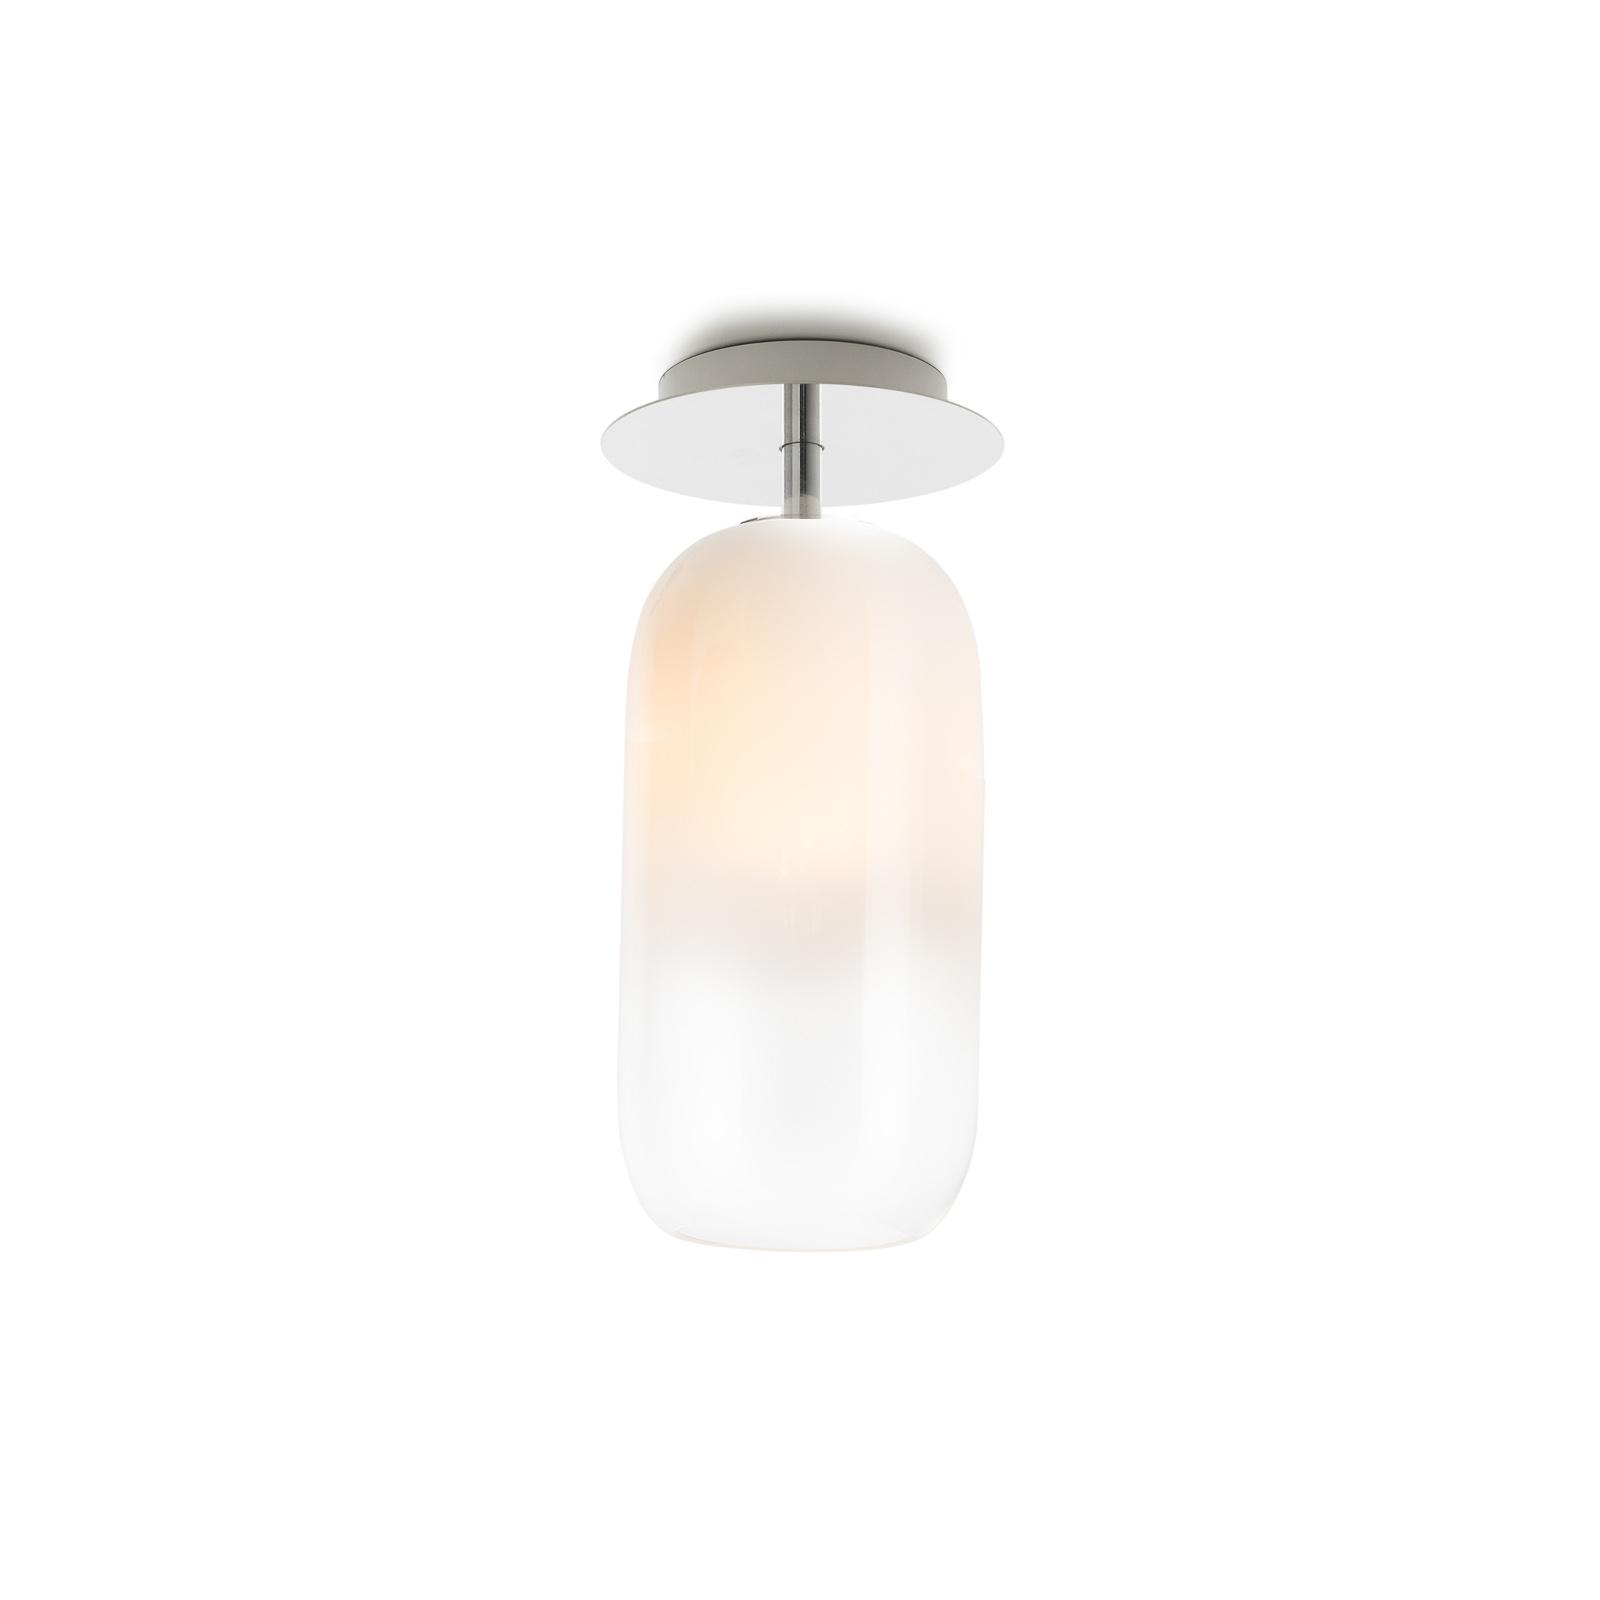 Artemide Gople Mini loftlampe hvid